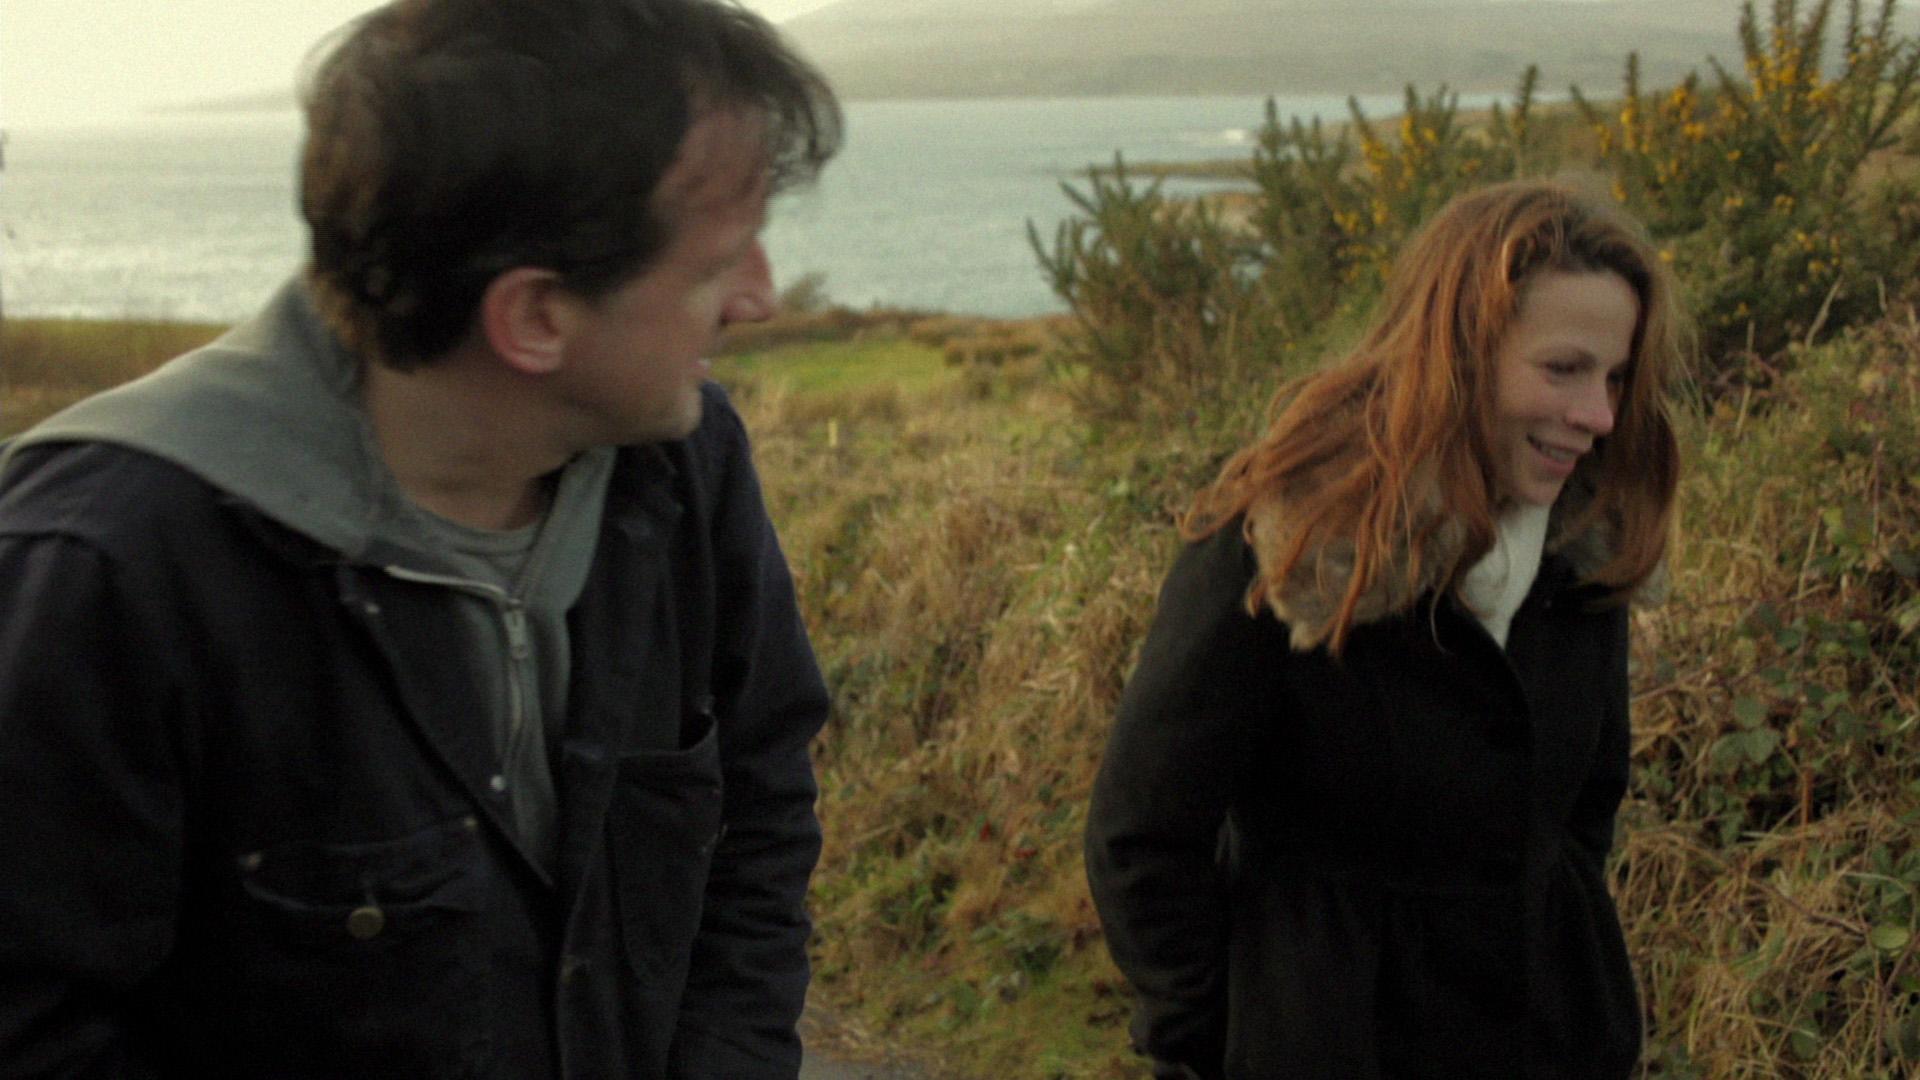 The-Pier-NITV-Network-Ireland-Television-1.jpg